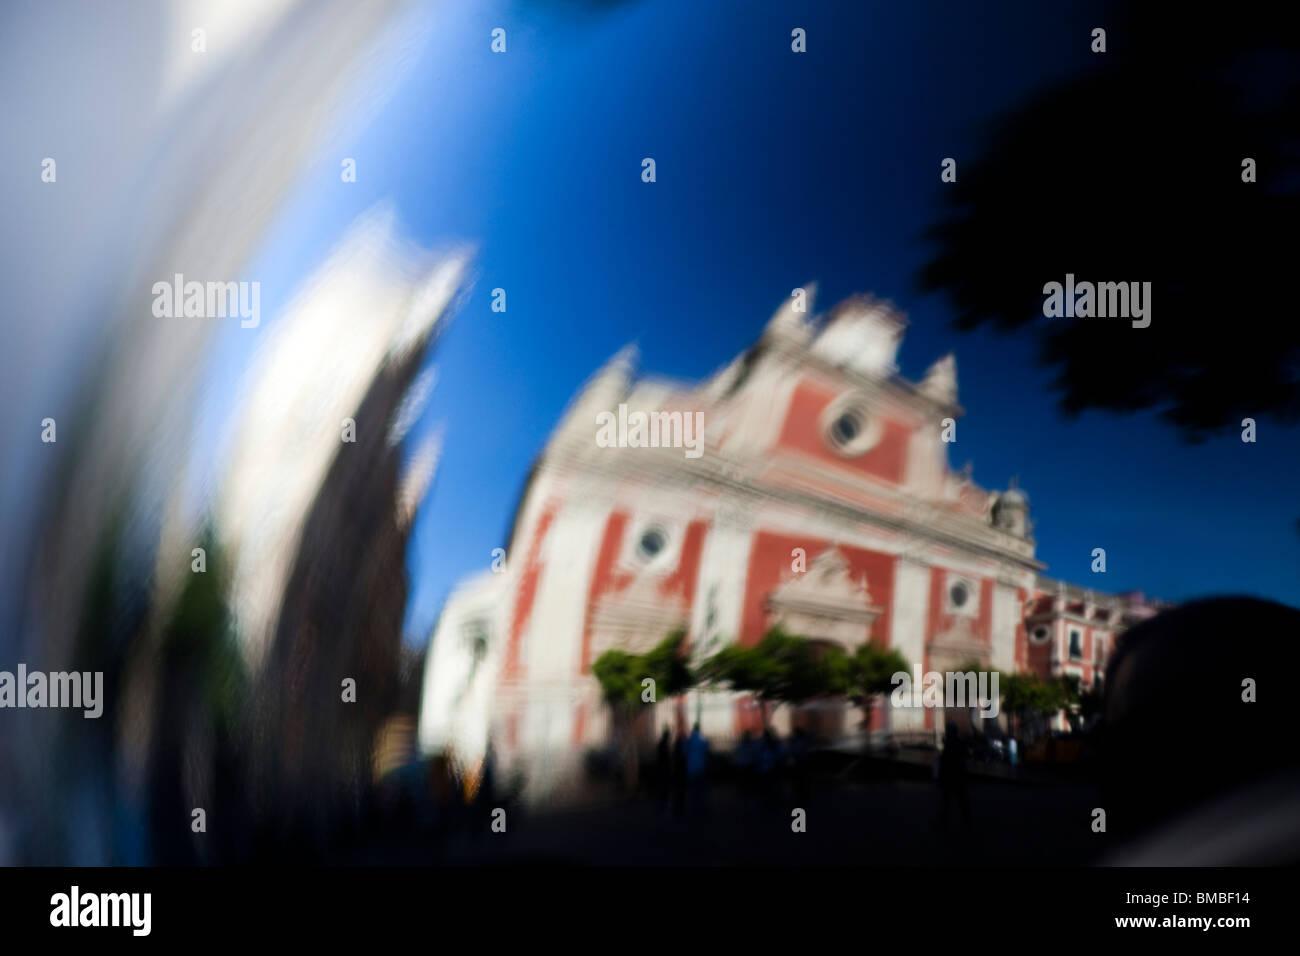 Iglesia de El Salvador refleja en un casco de seguridad, Sevilla, España Imagen De Stock